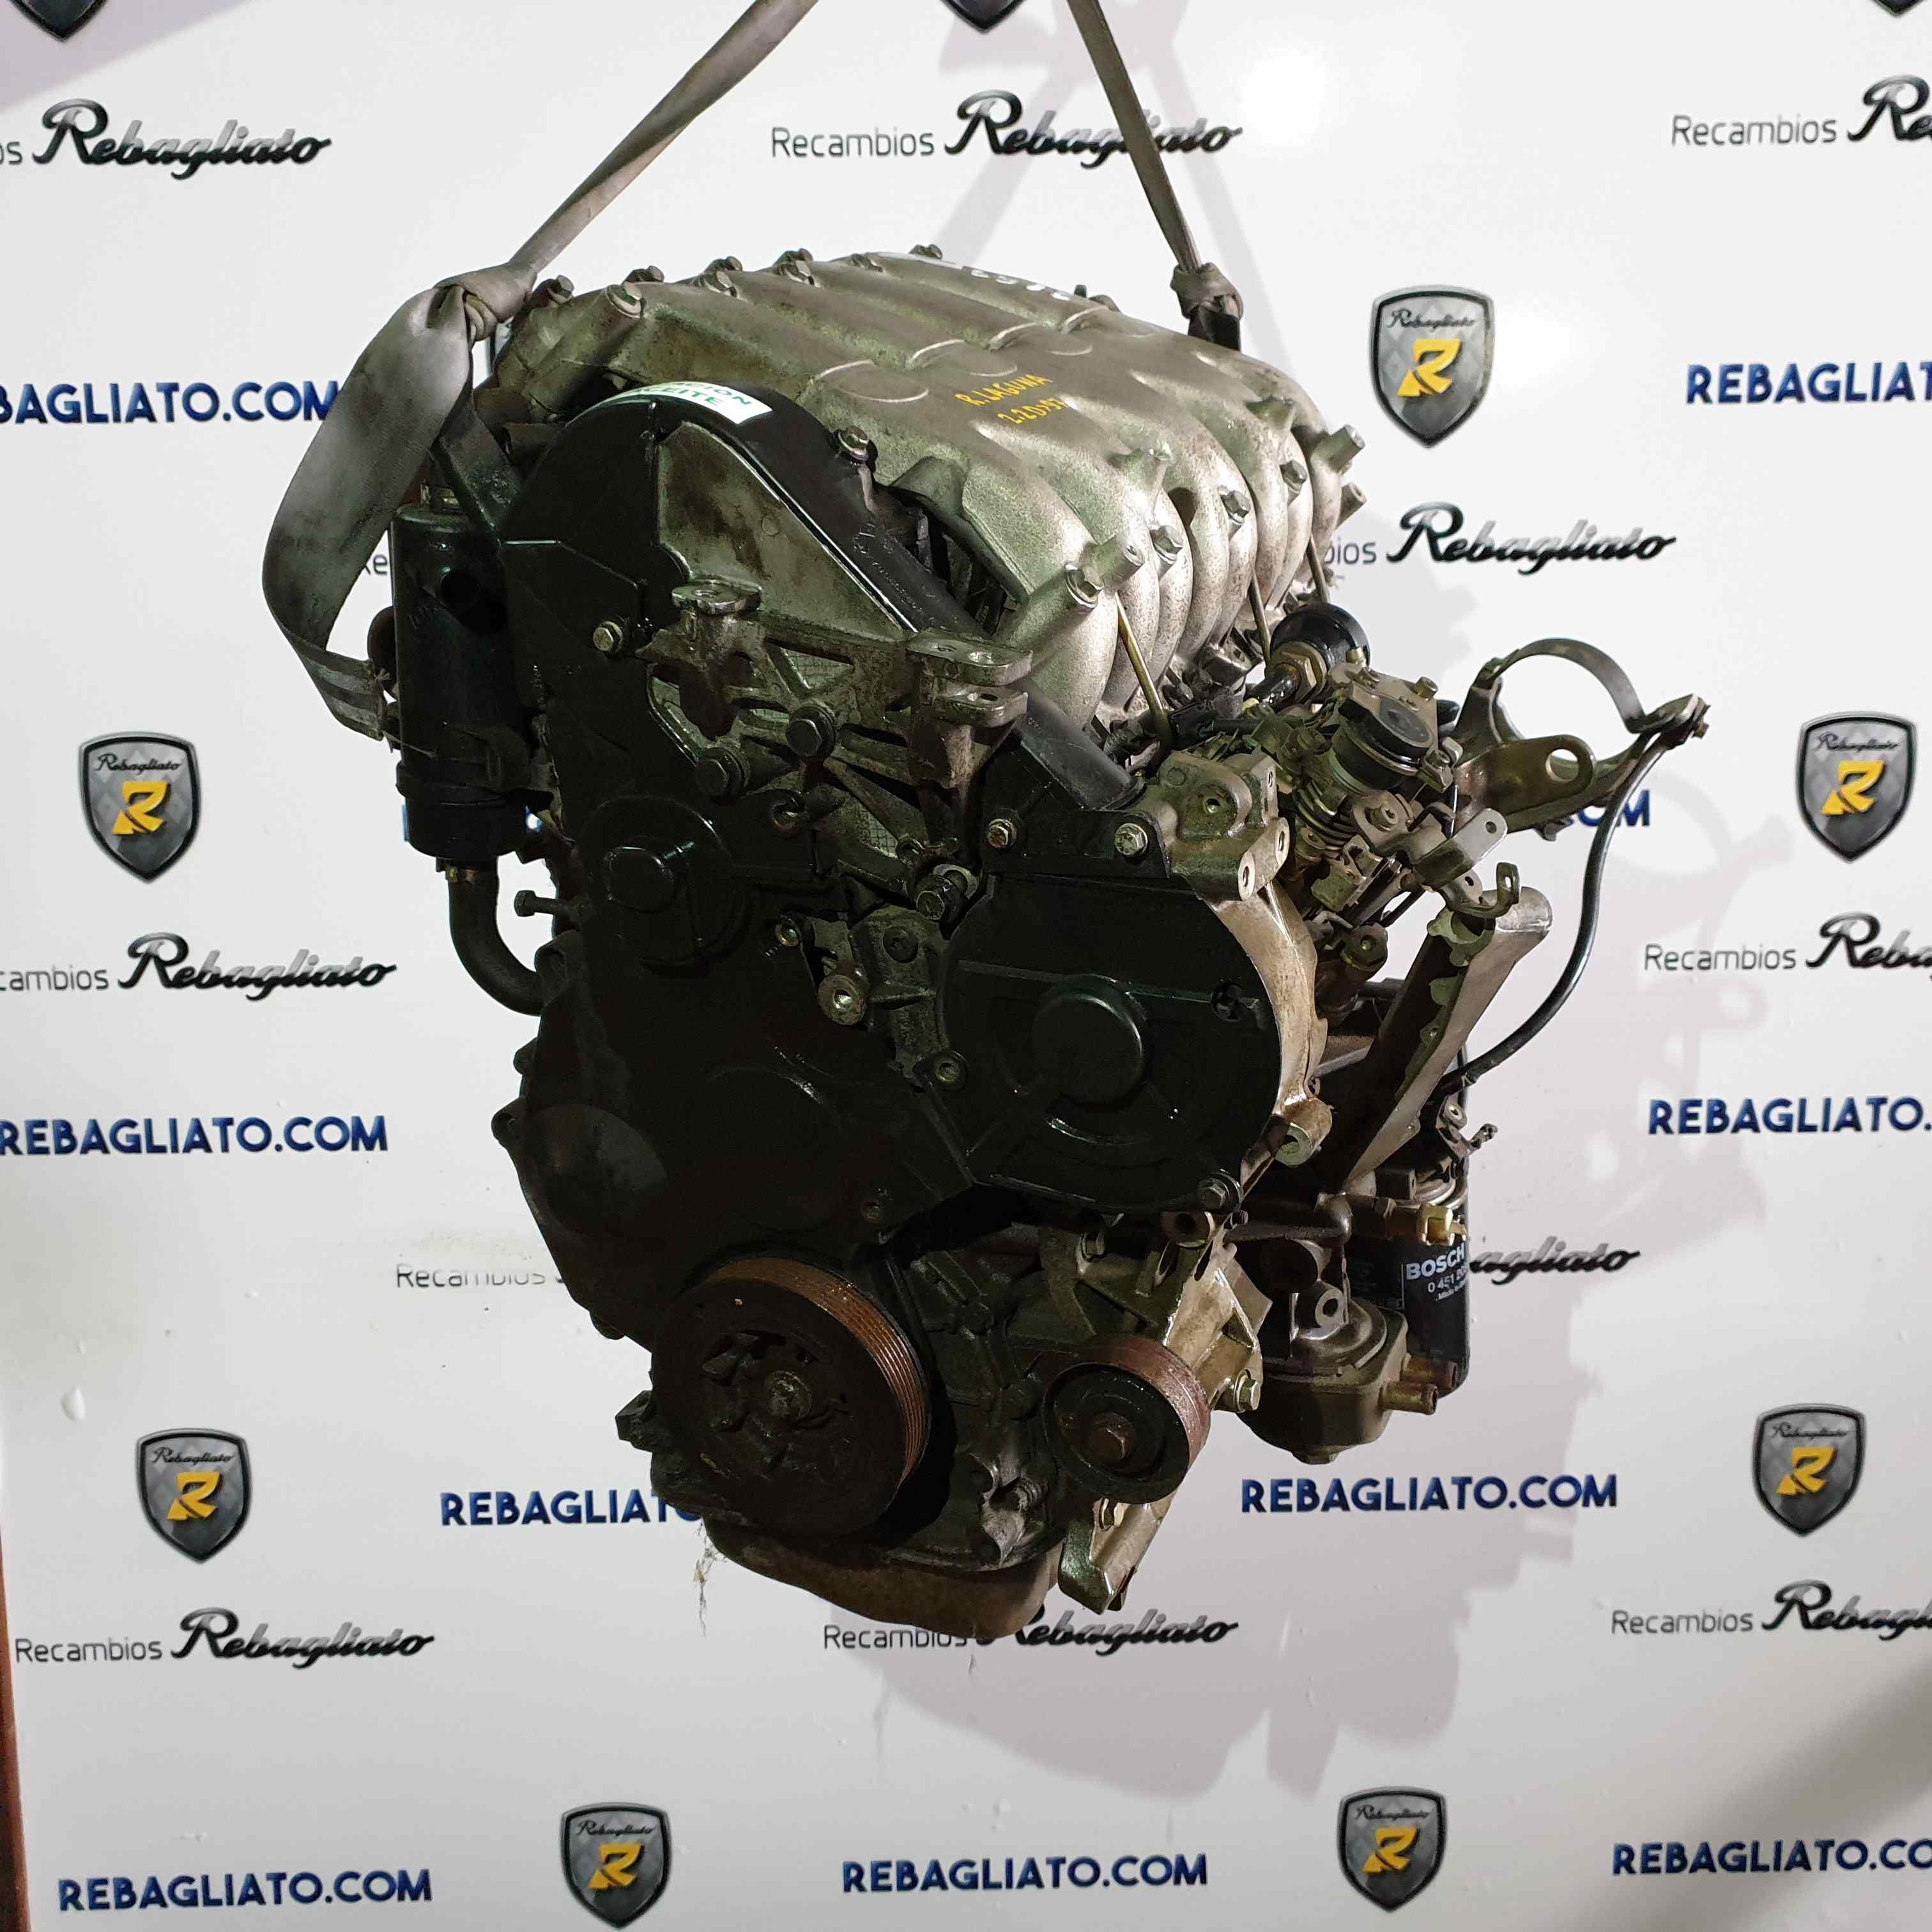 Motor completo de Renault Laguna (b56) (1994 - 1998) 2153